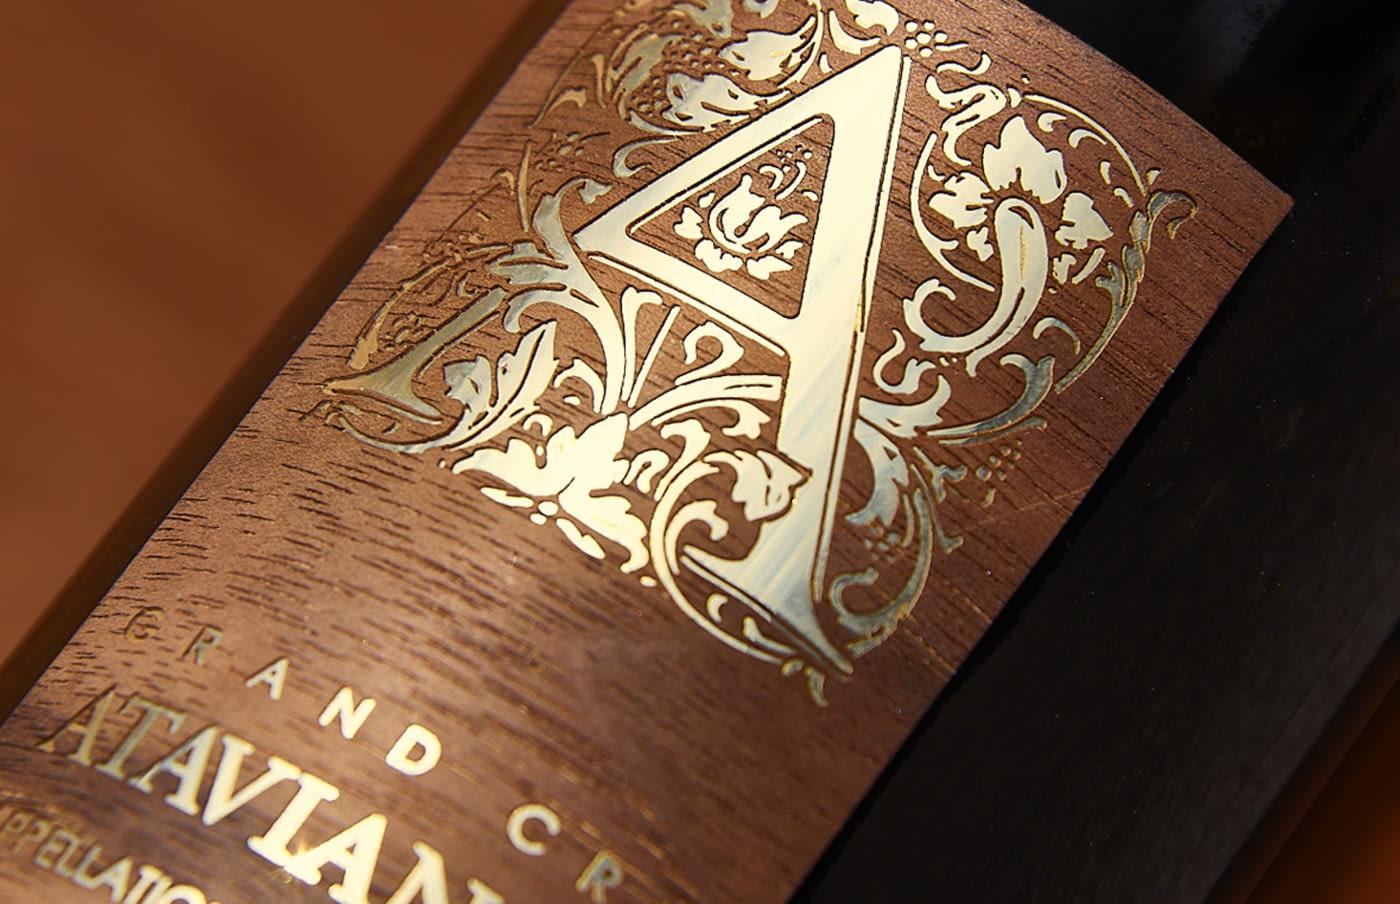 Etiquetas añejas para vinos añejos